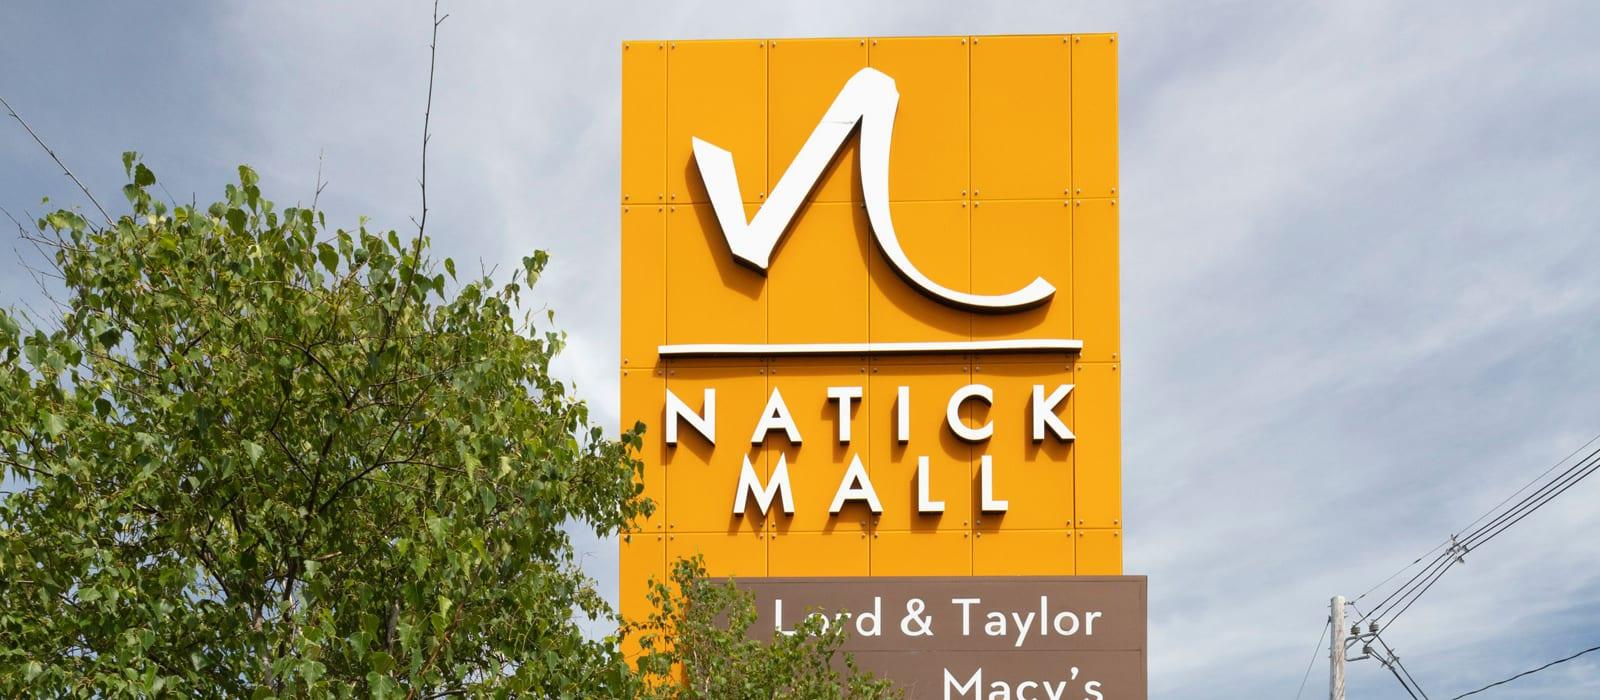 Natick mall near Alta Union House in Framingham, MA